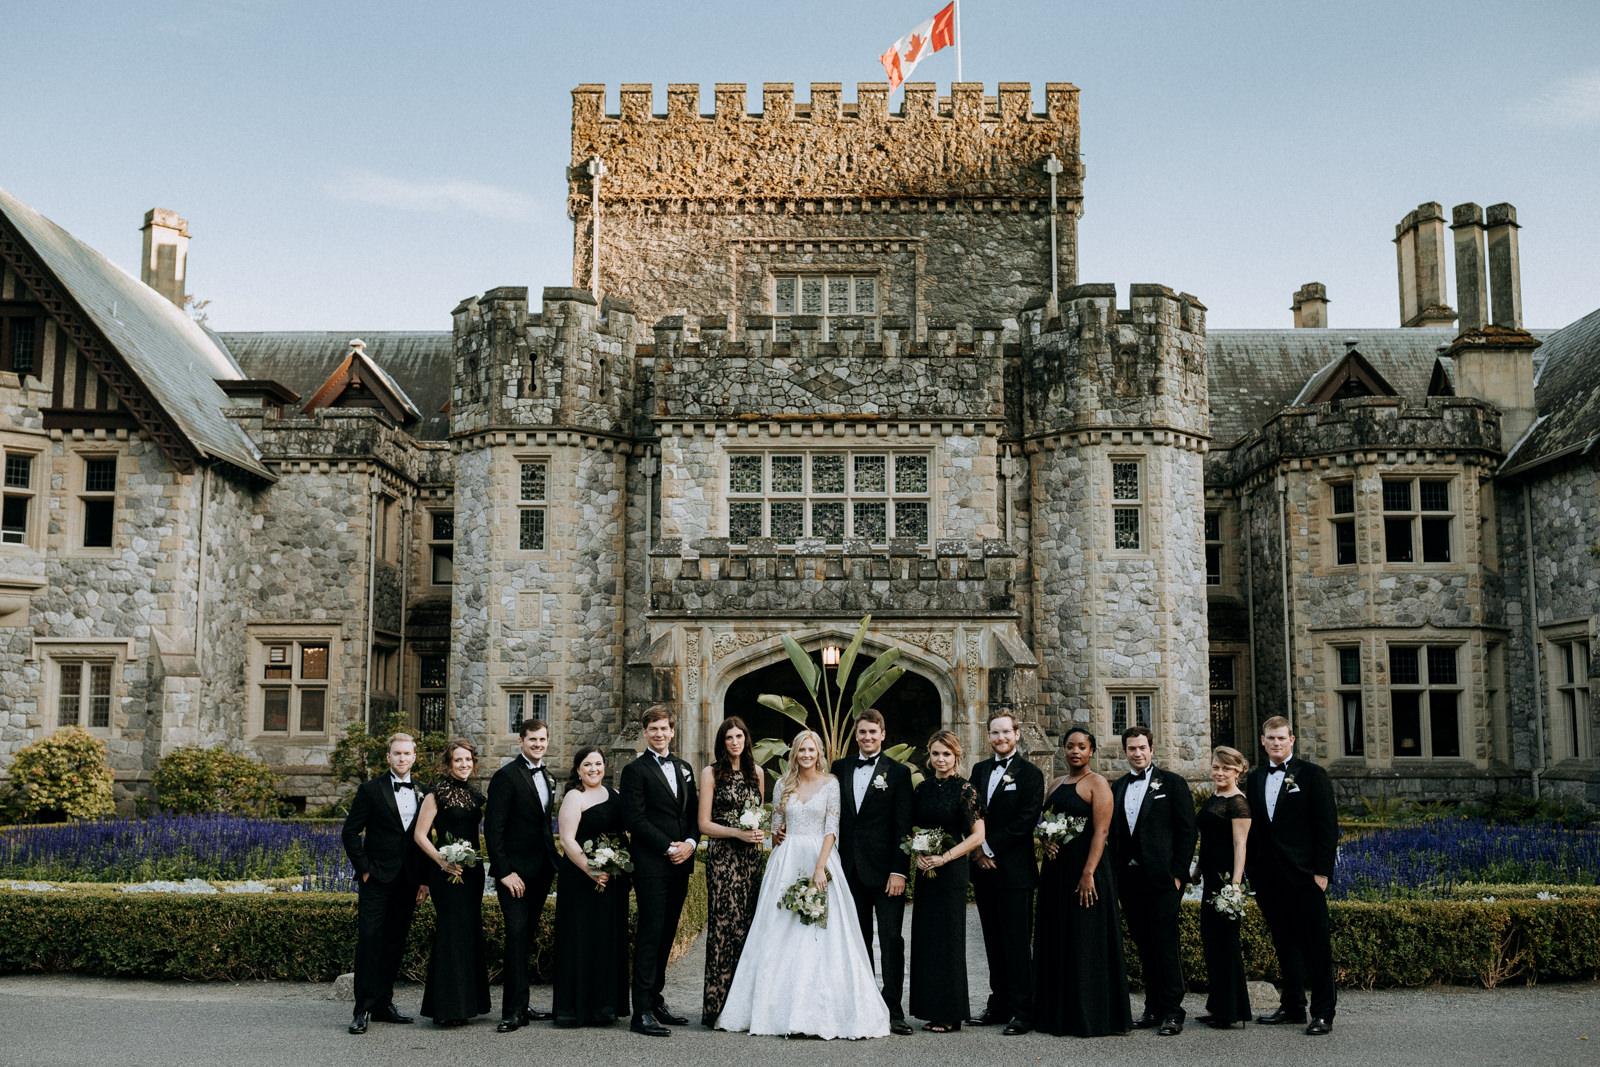 Bridal party at Hatley Castle Wedding Photographer